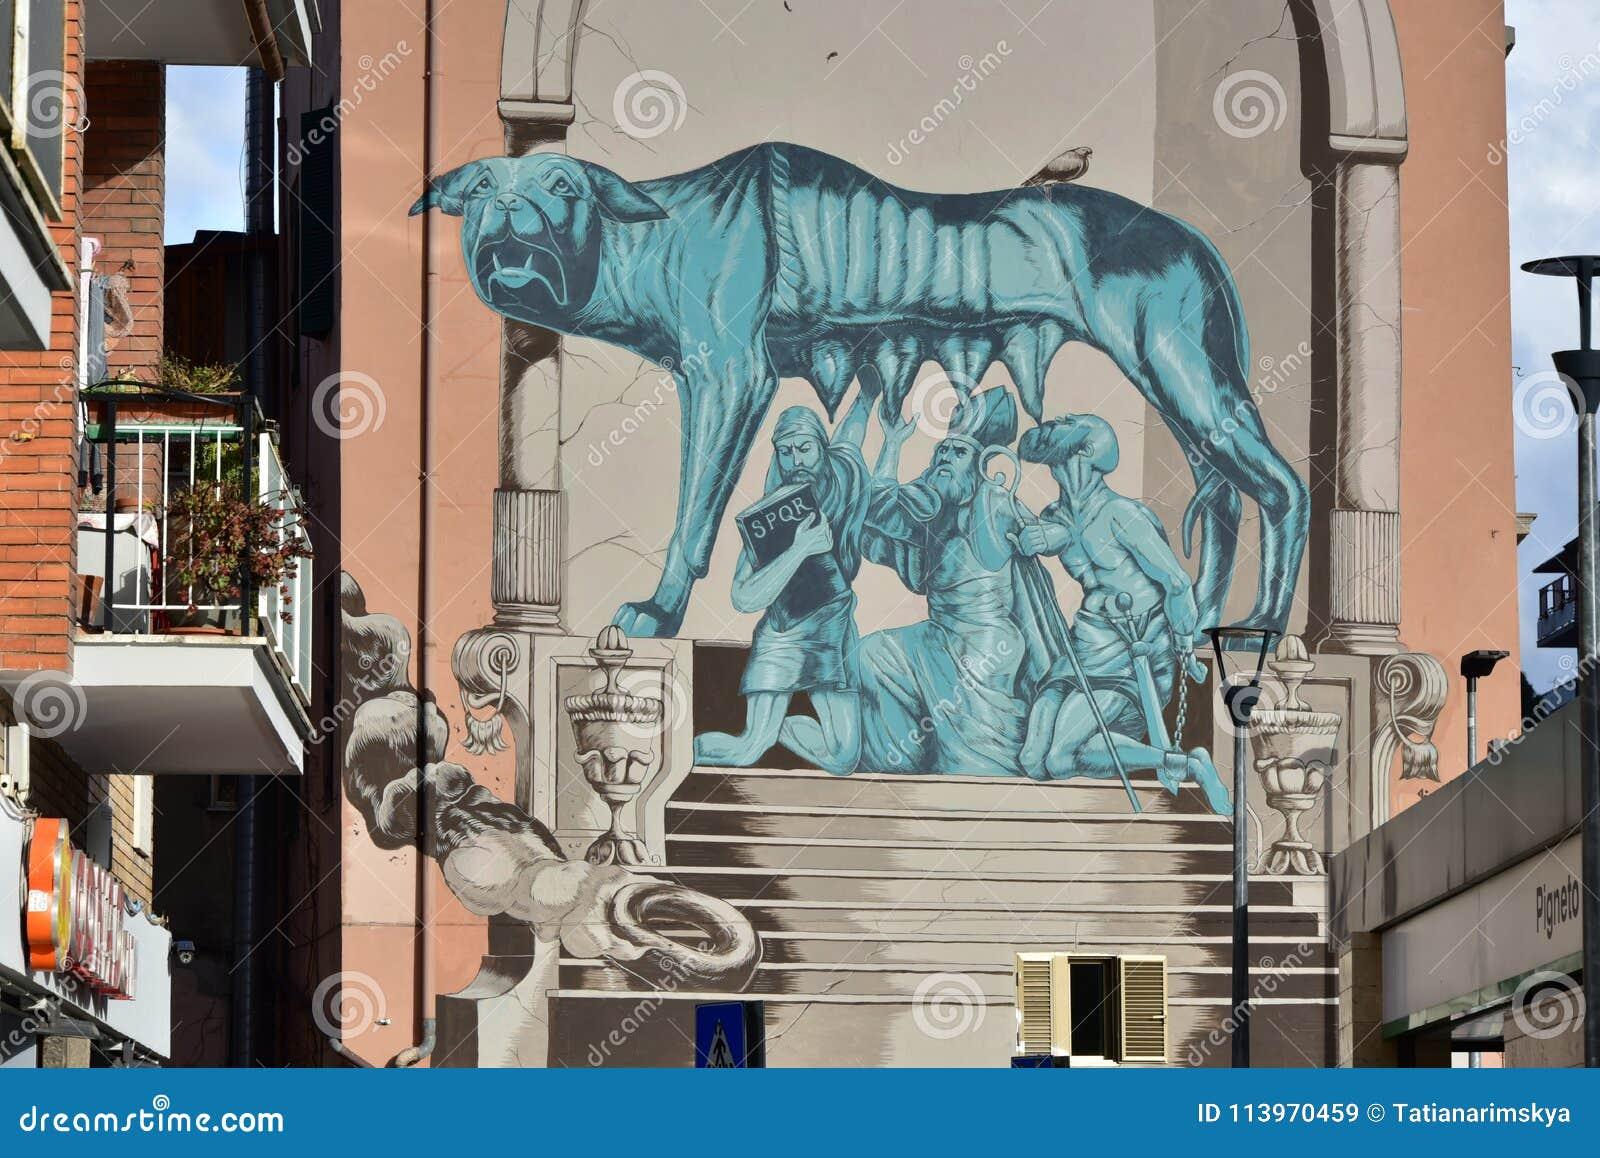 Street Art And Graffiti In Rome Pigneto District